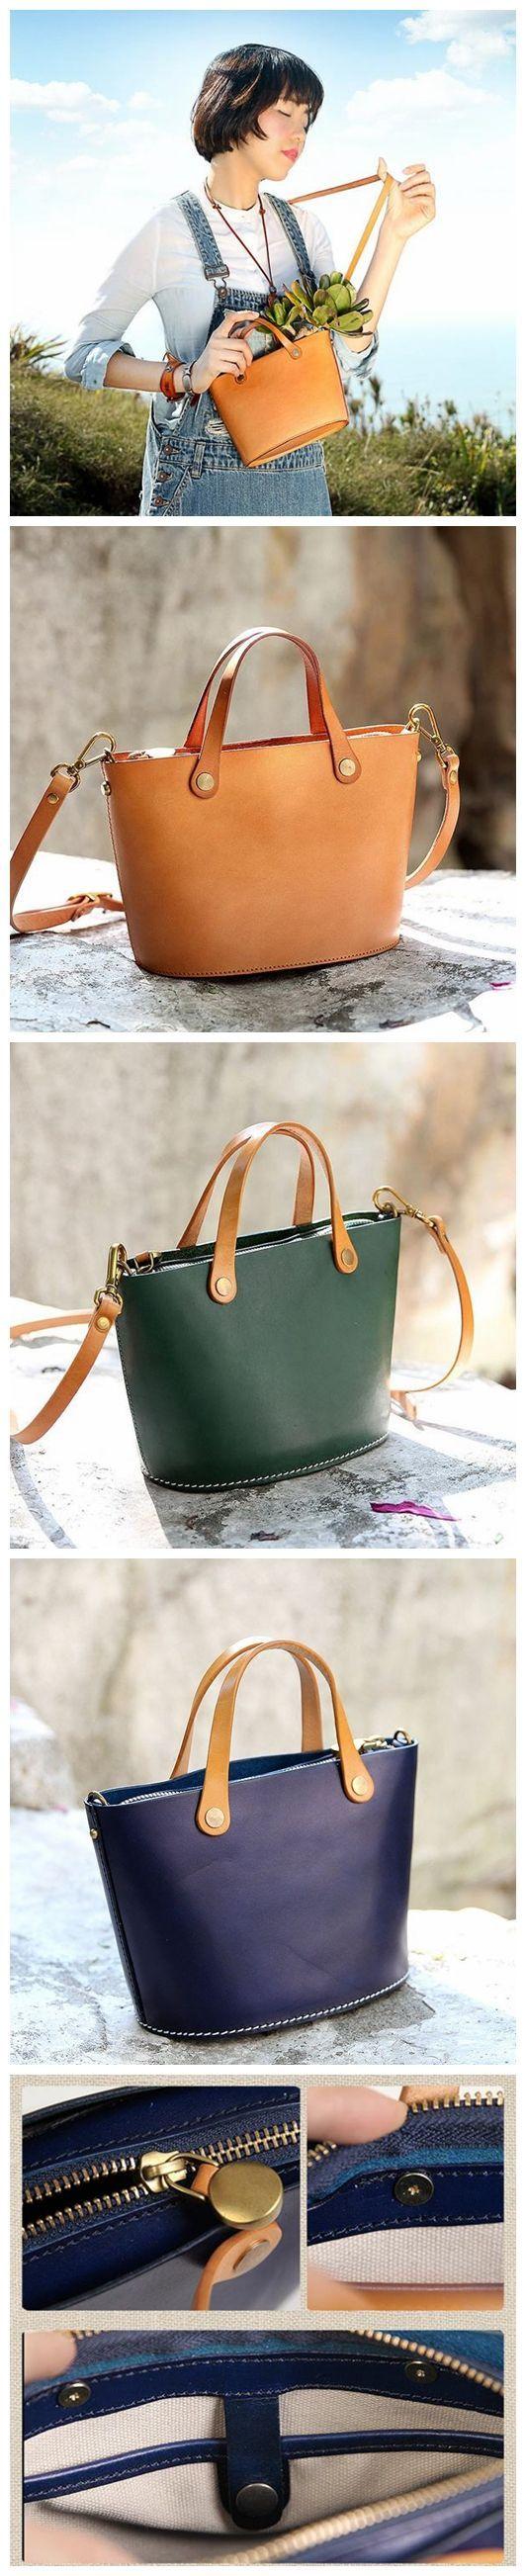 Handmade Natural Blue Leather Handbag Messenger Bag Small Satchel 15020